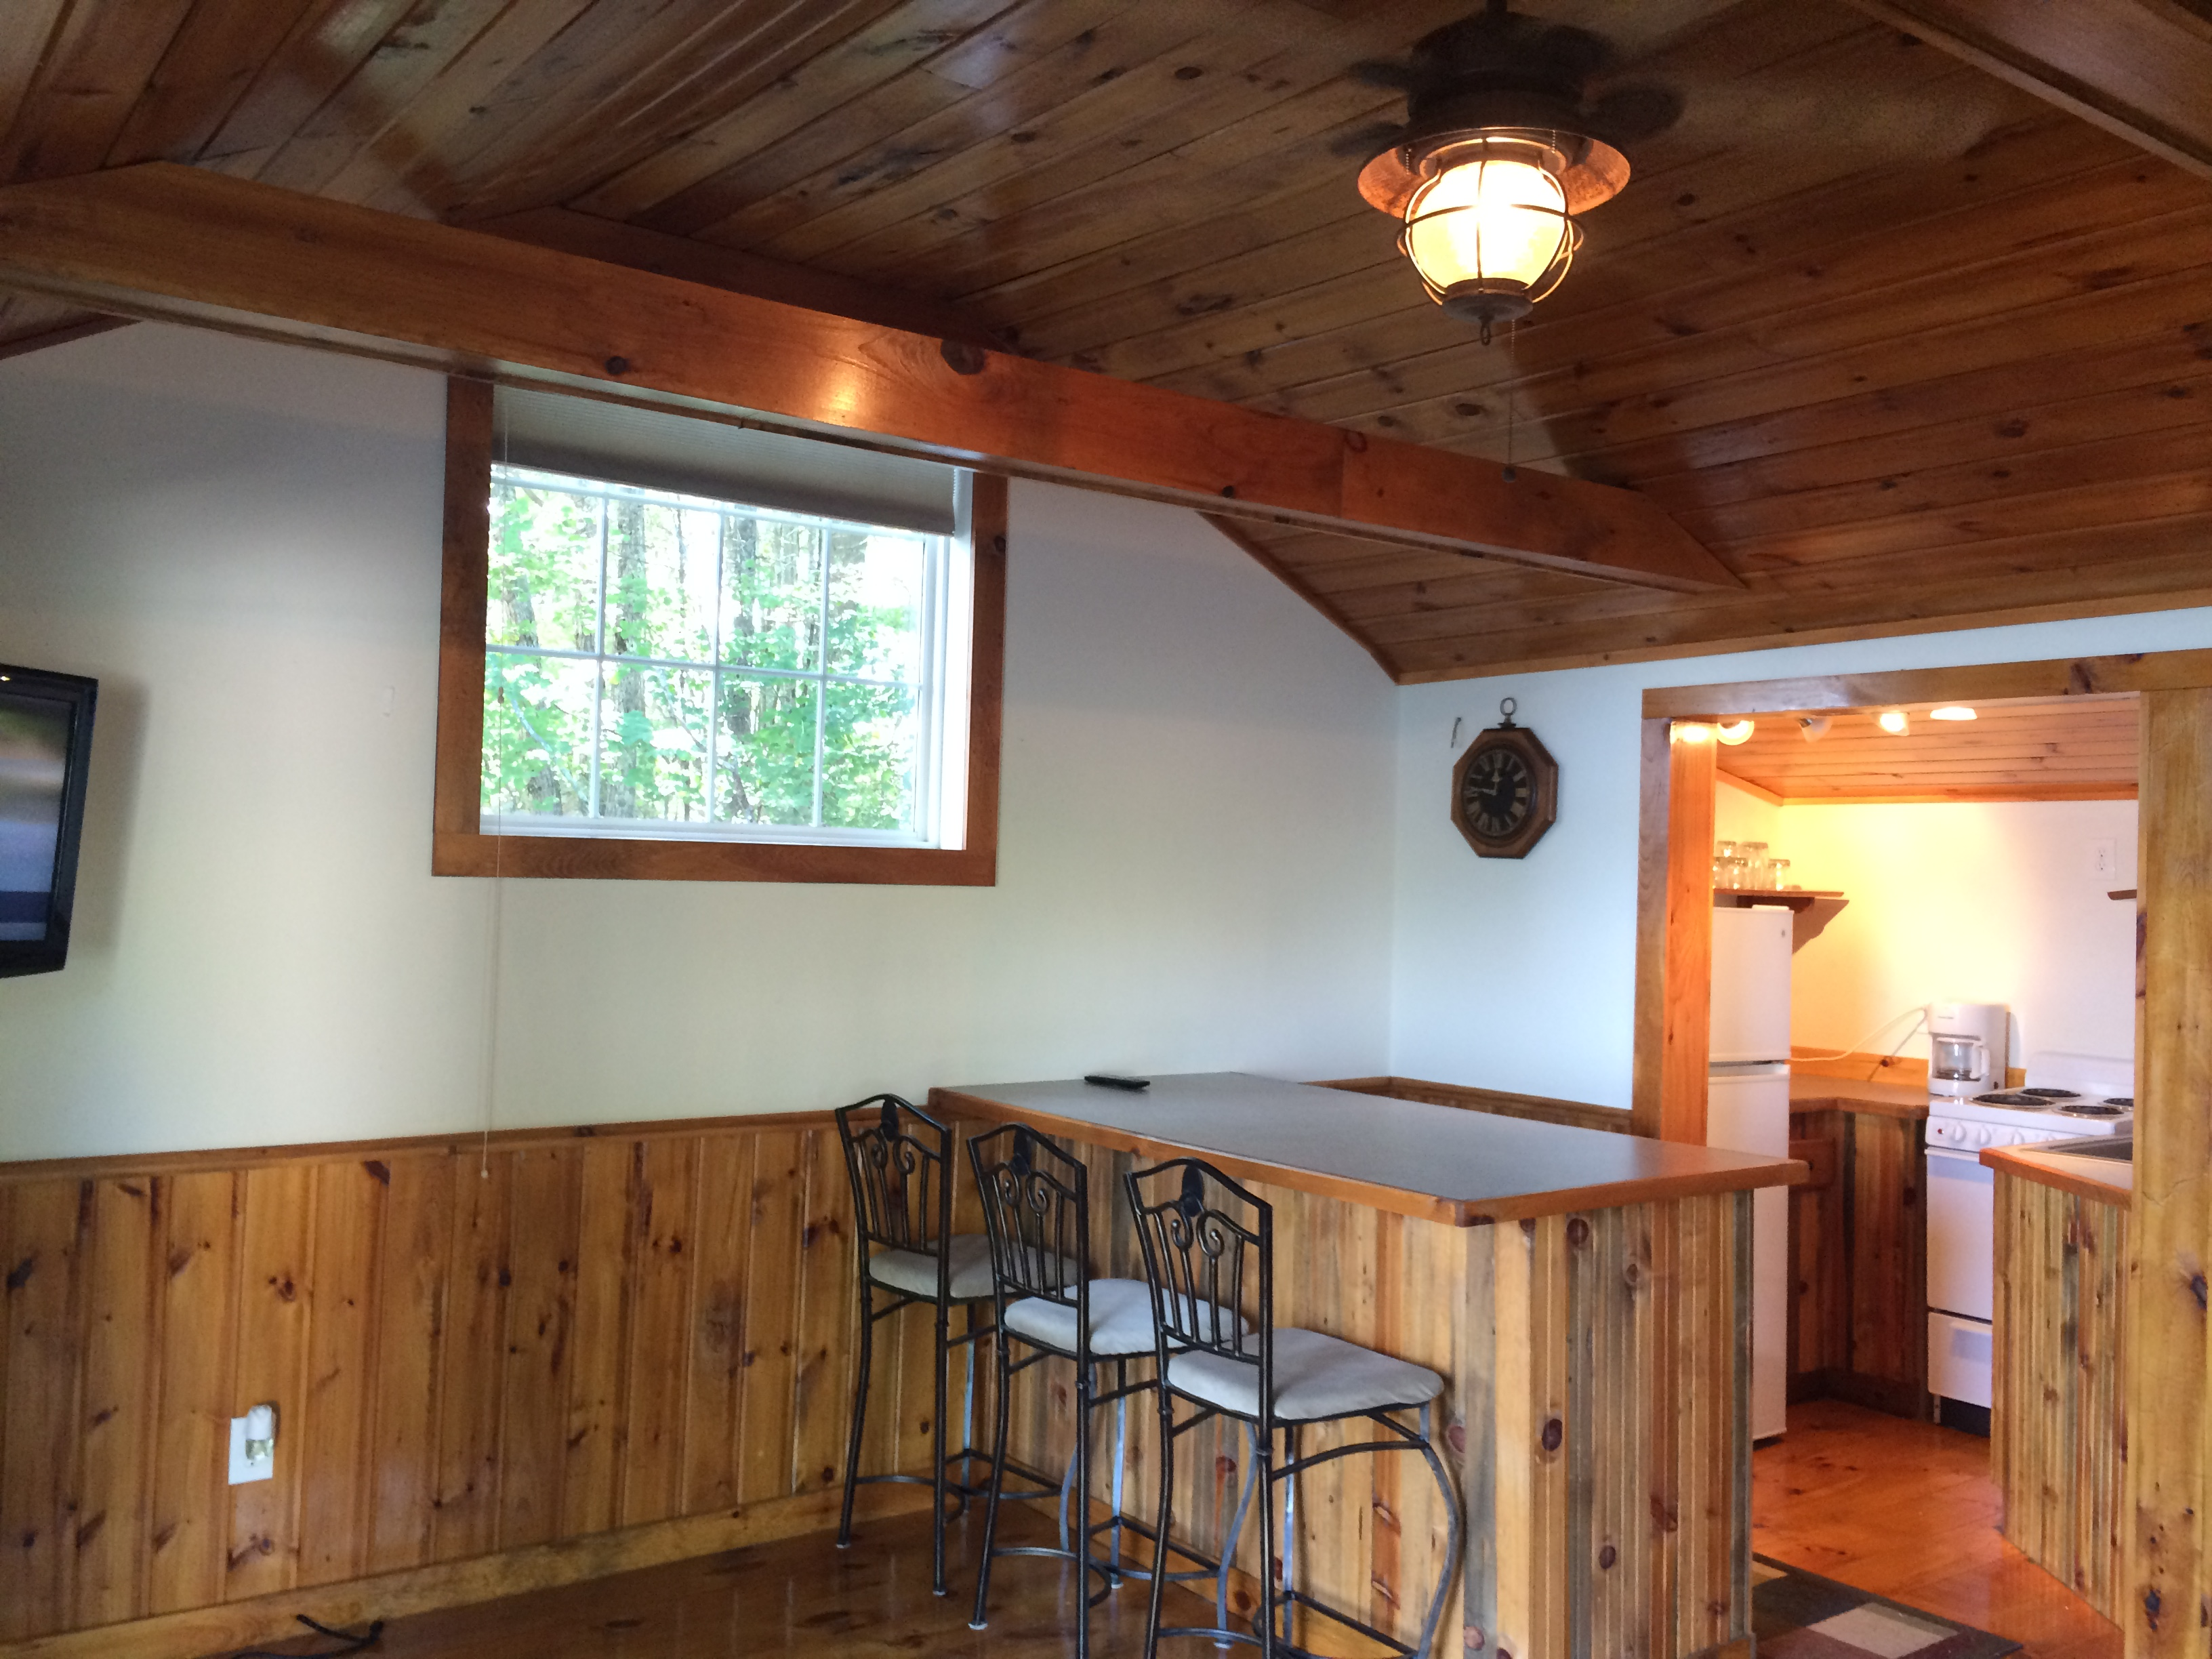 coming x cabin photo of rentals gatlinburg colors intense marvelous att cabins nh fall soon log tennessee